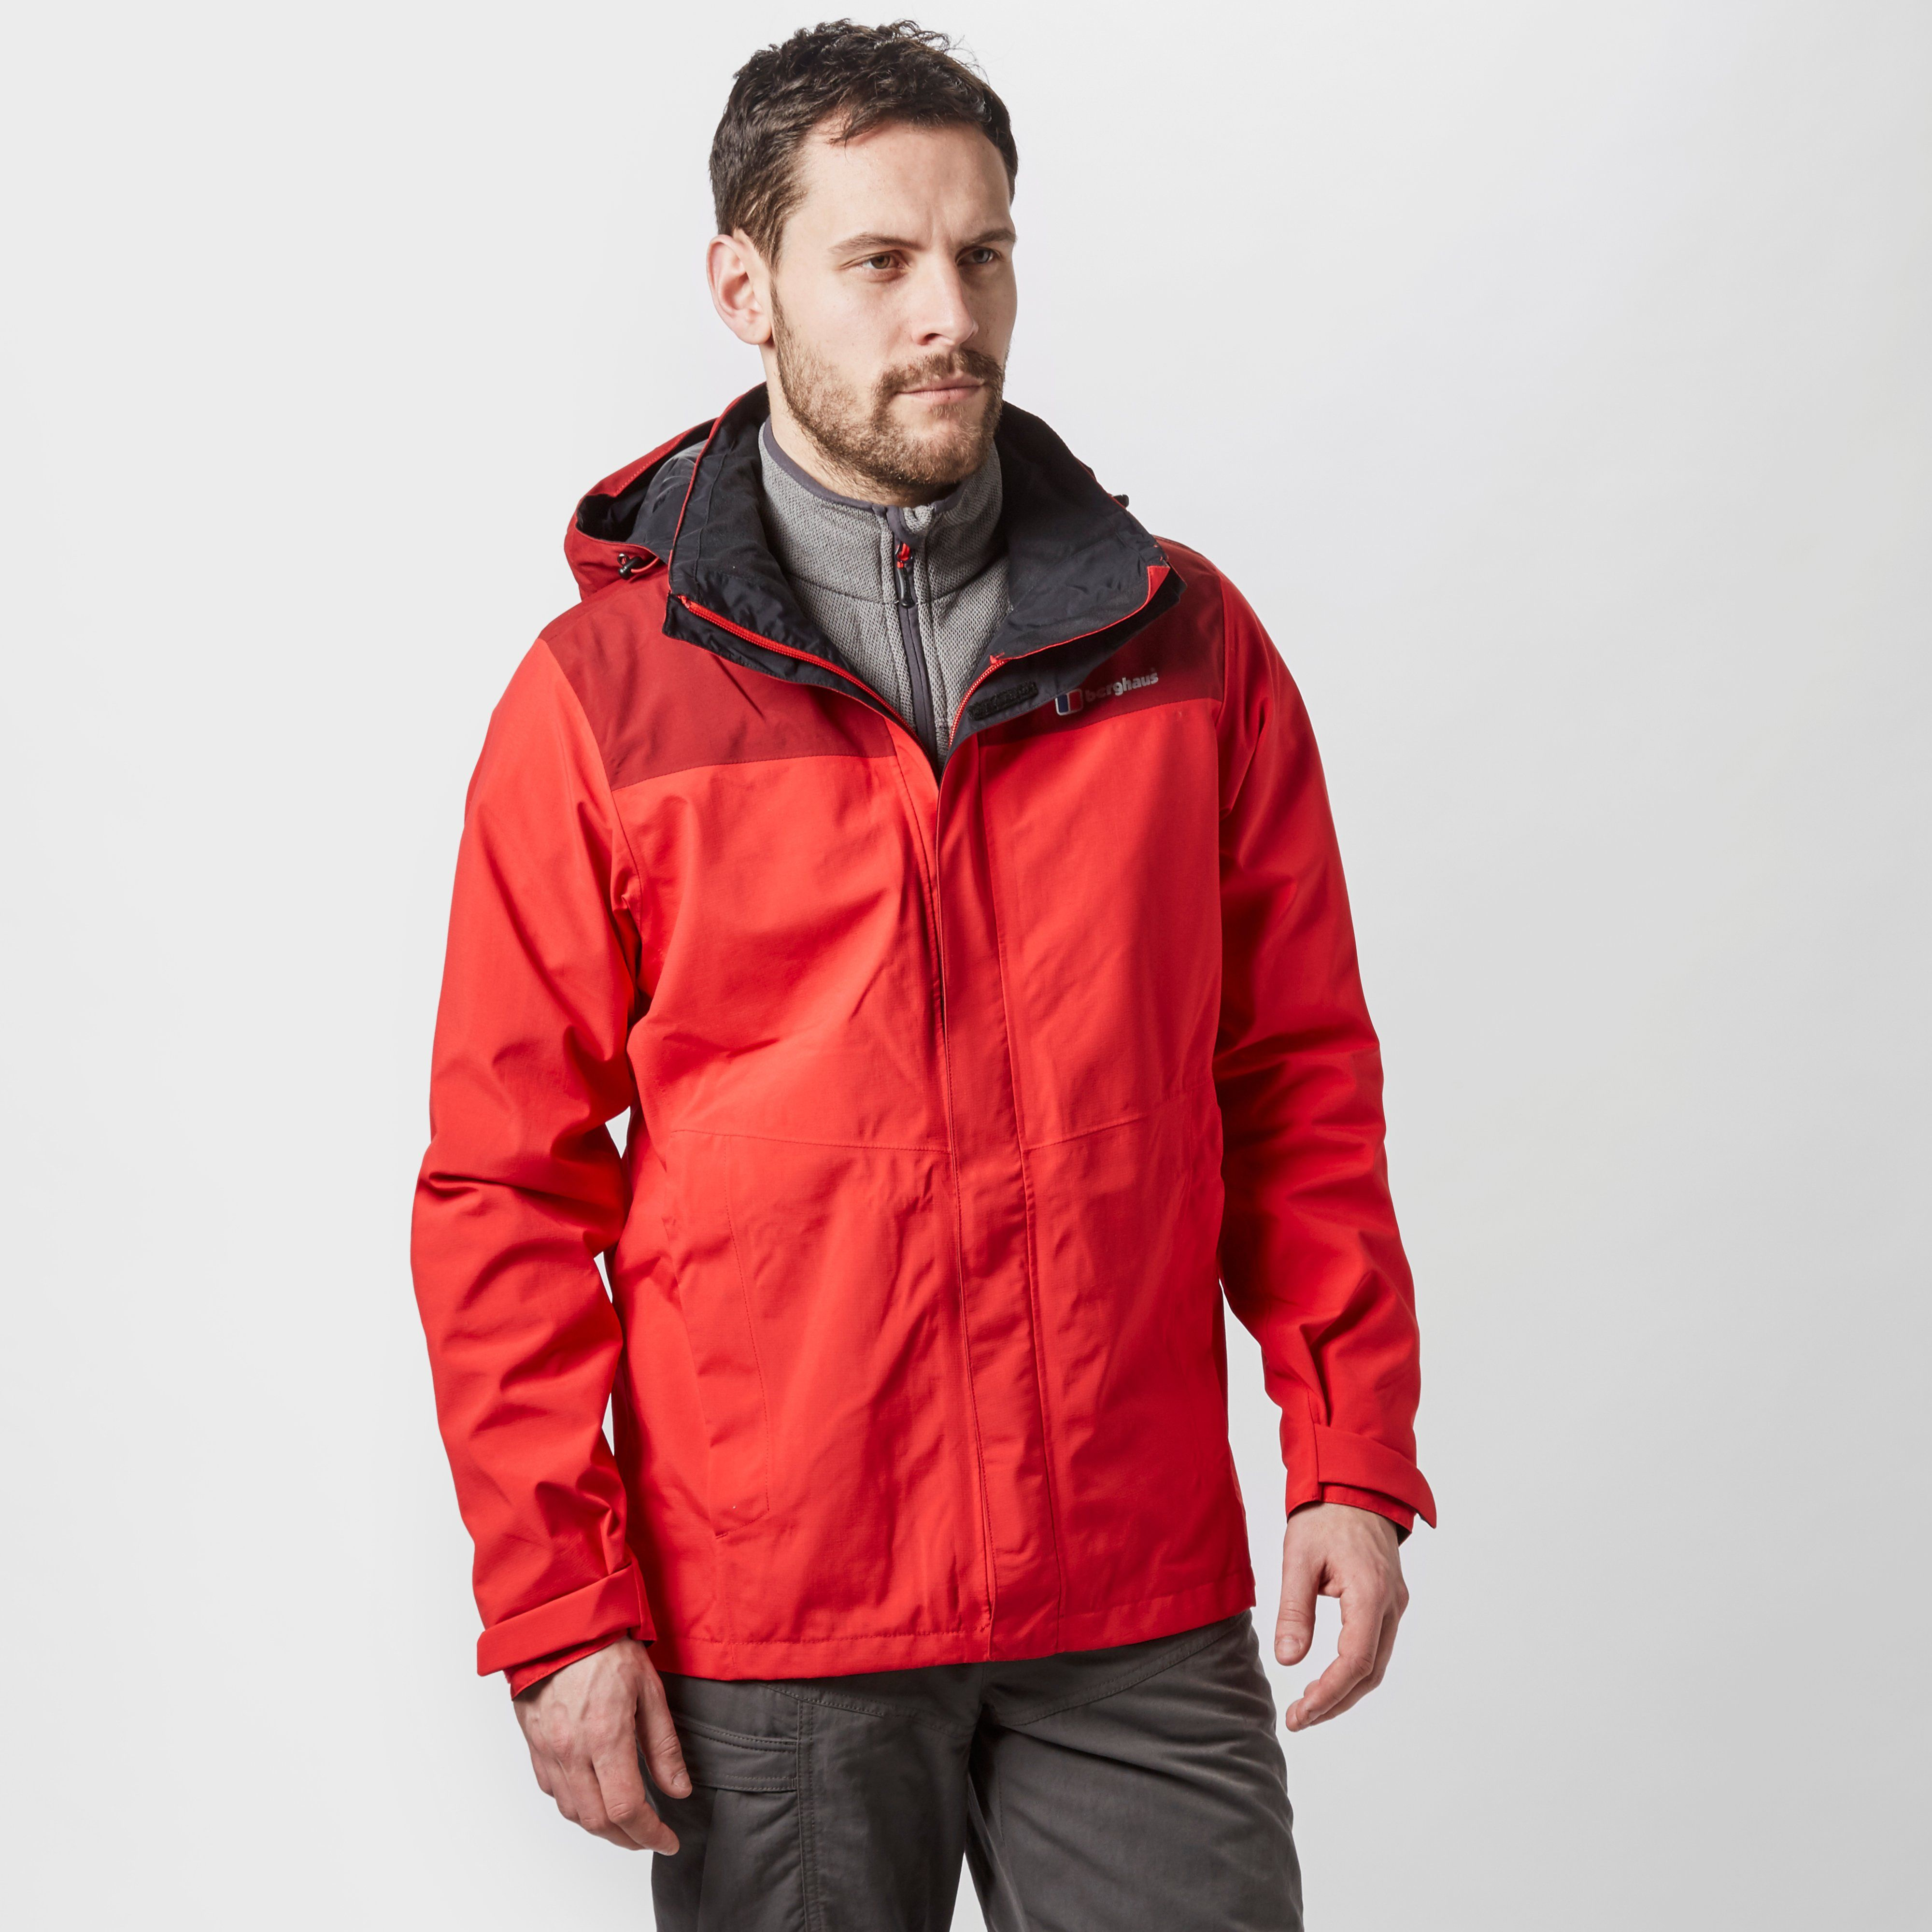 BERGHAUS Men's Hillwalker GORE-TEX® Jacket